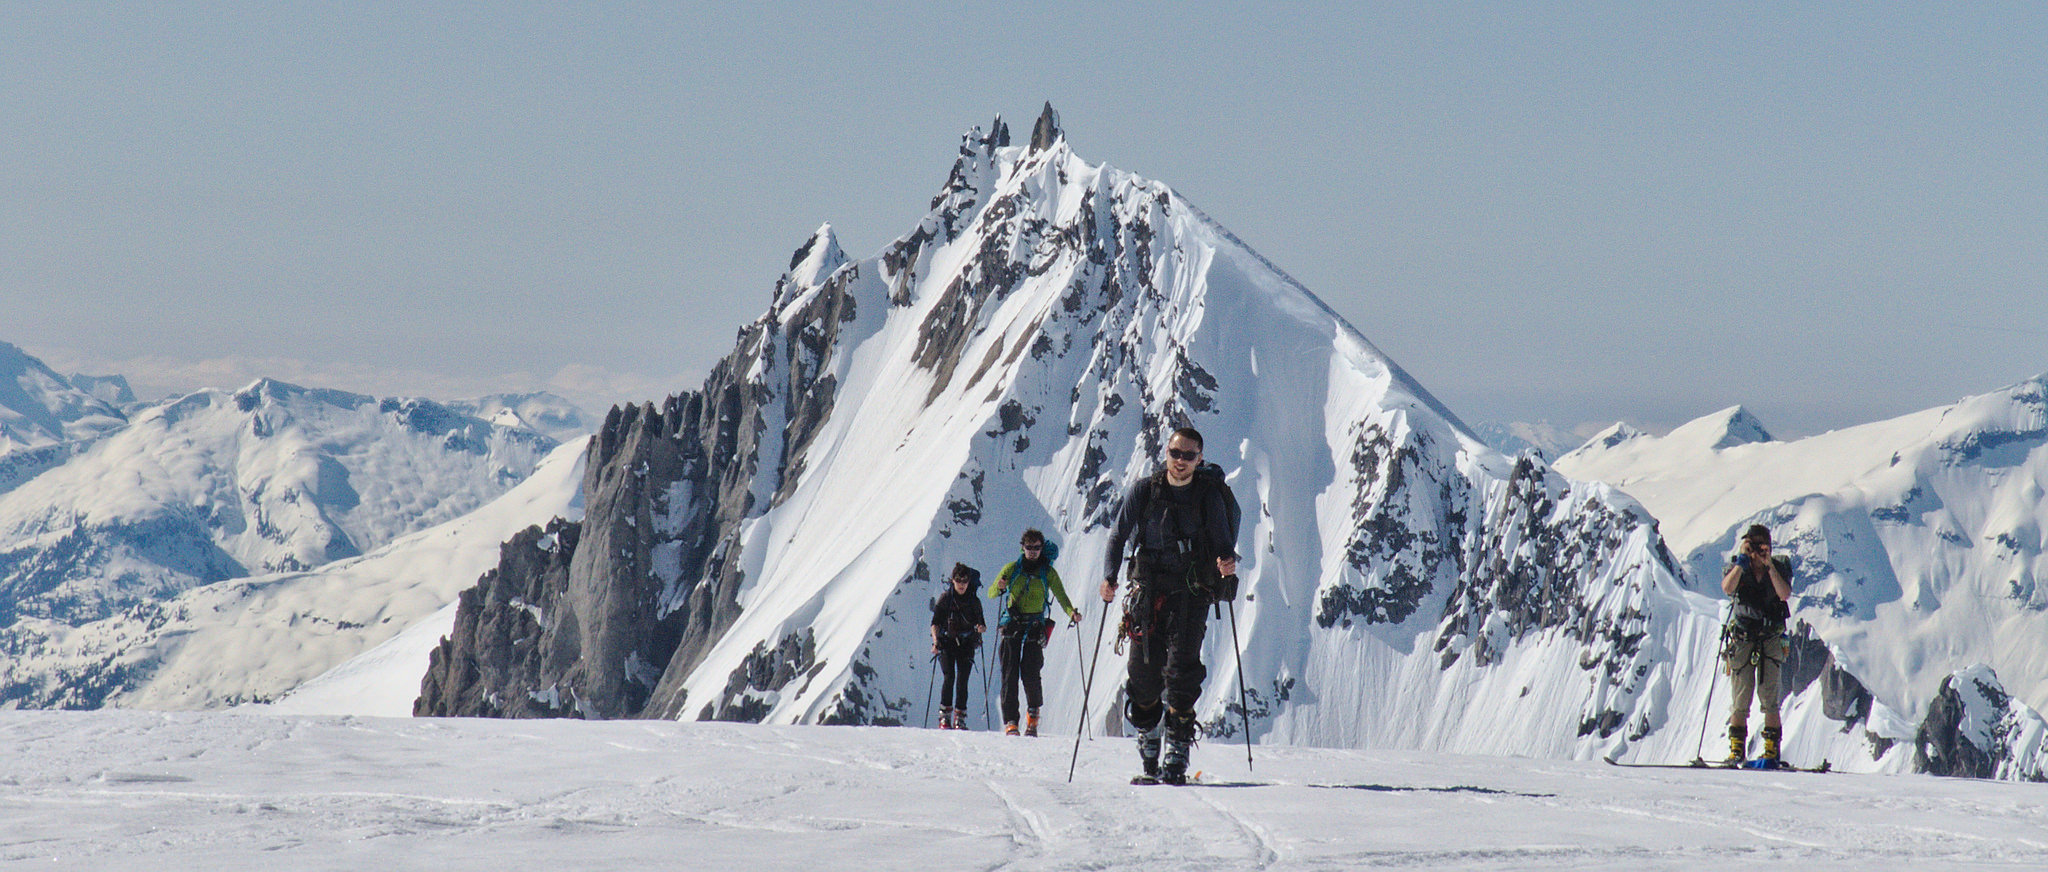 Powder Mountain Horseshoe - Clemens